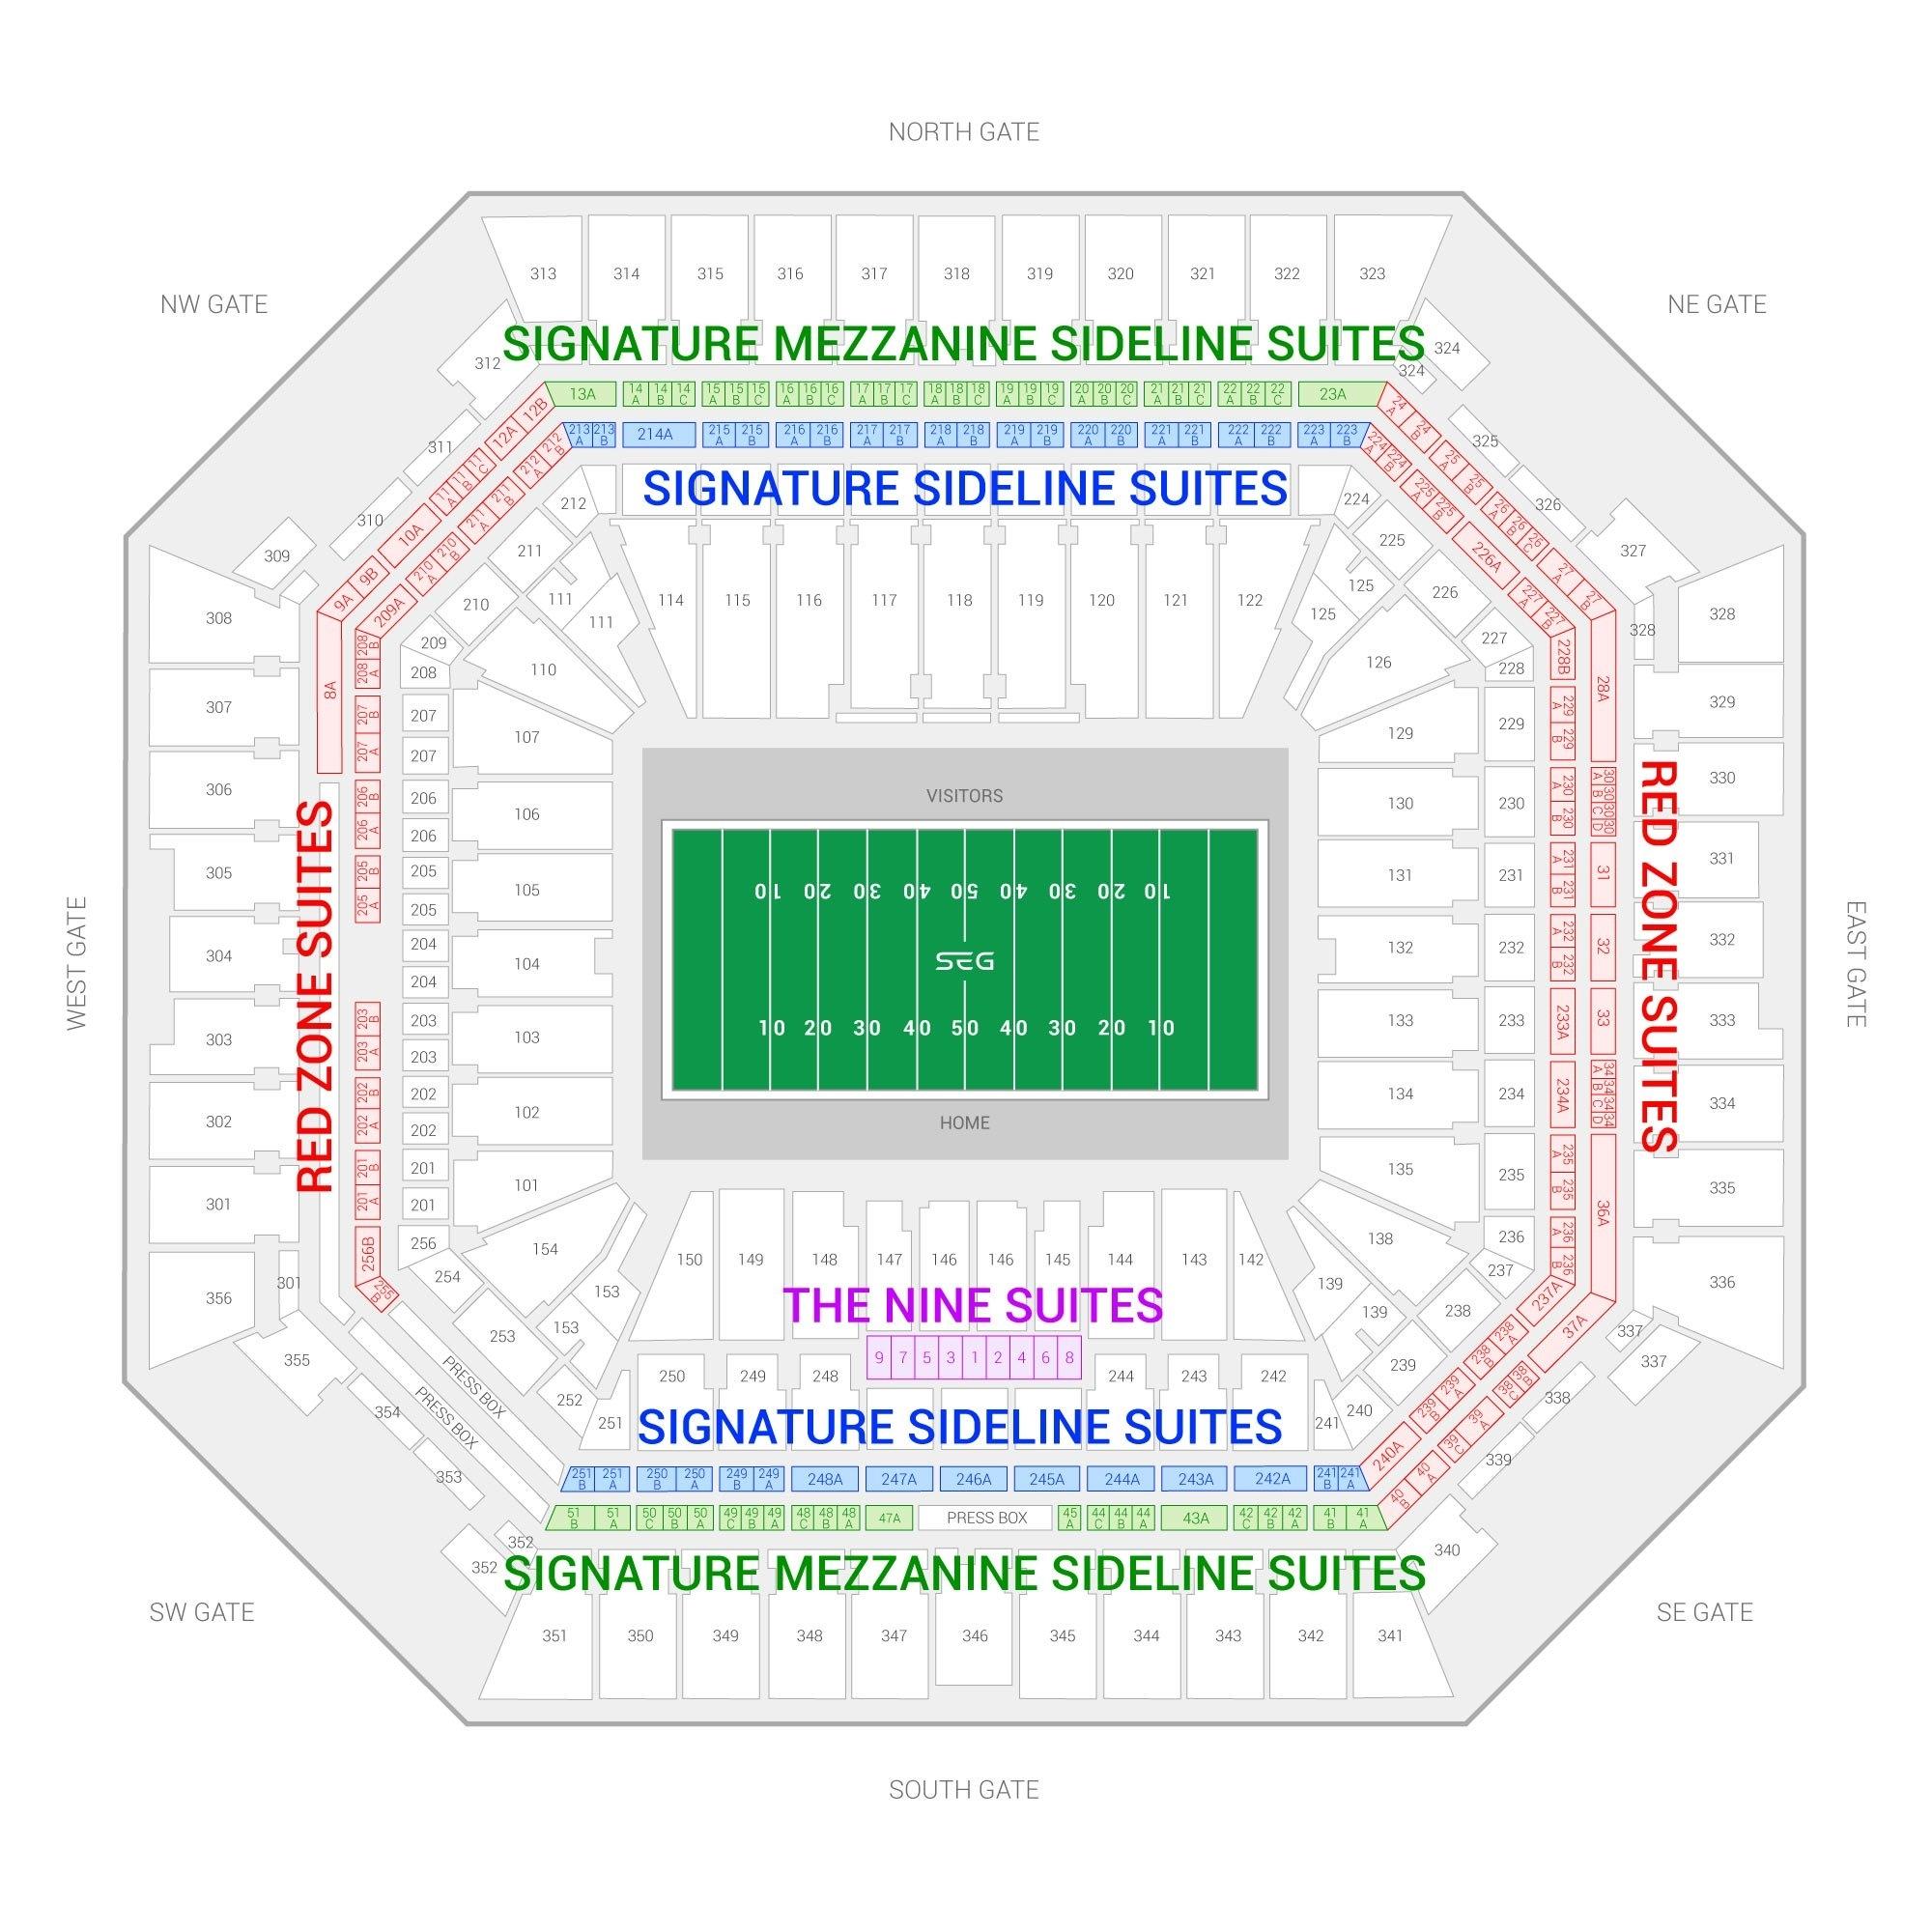 Super Bowl Liv Suite Rentals   Hard Rock Stadium intended for Super Bowl Seating Capacity